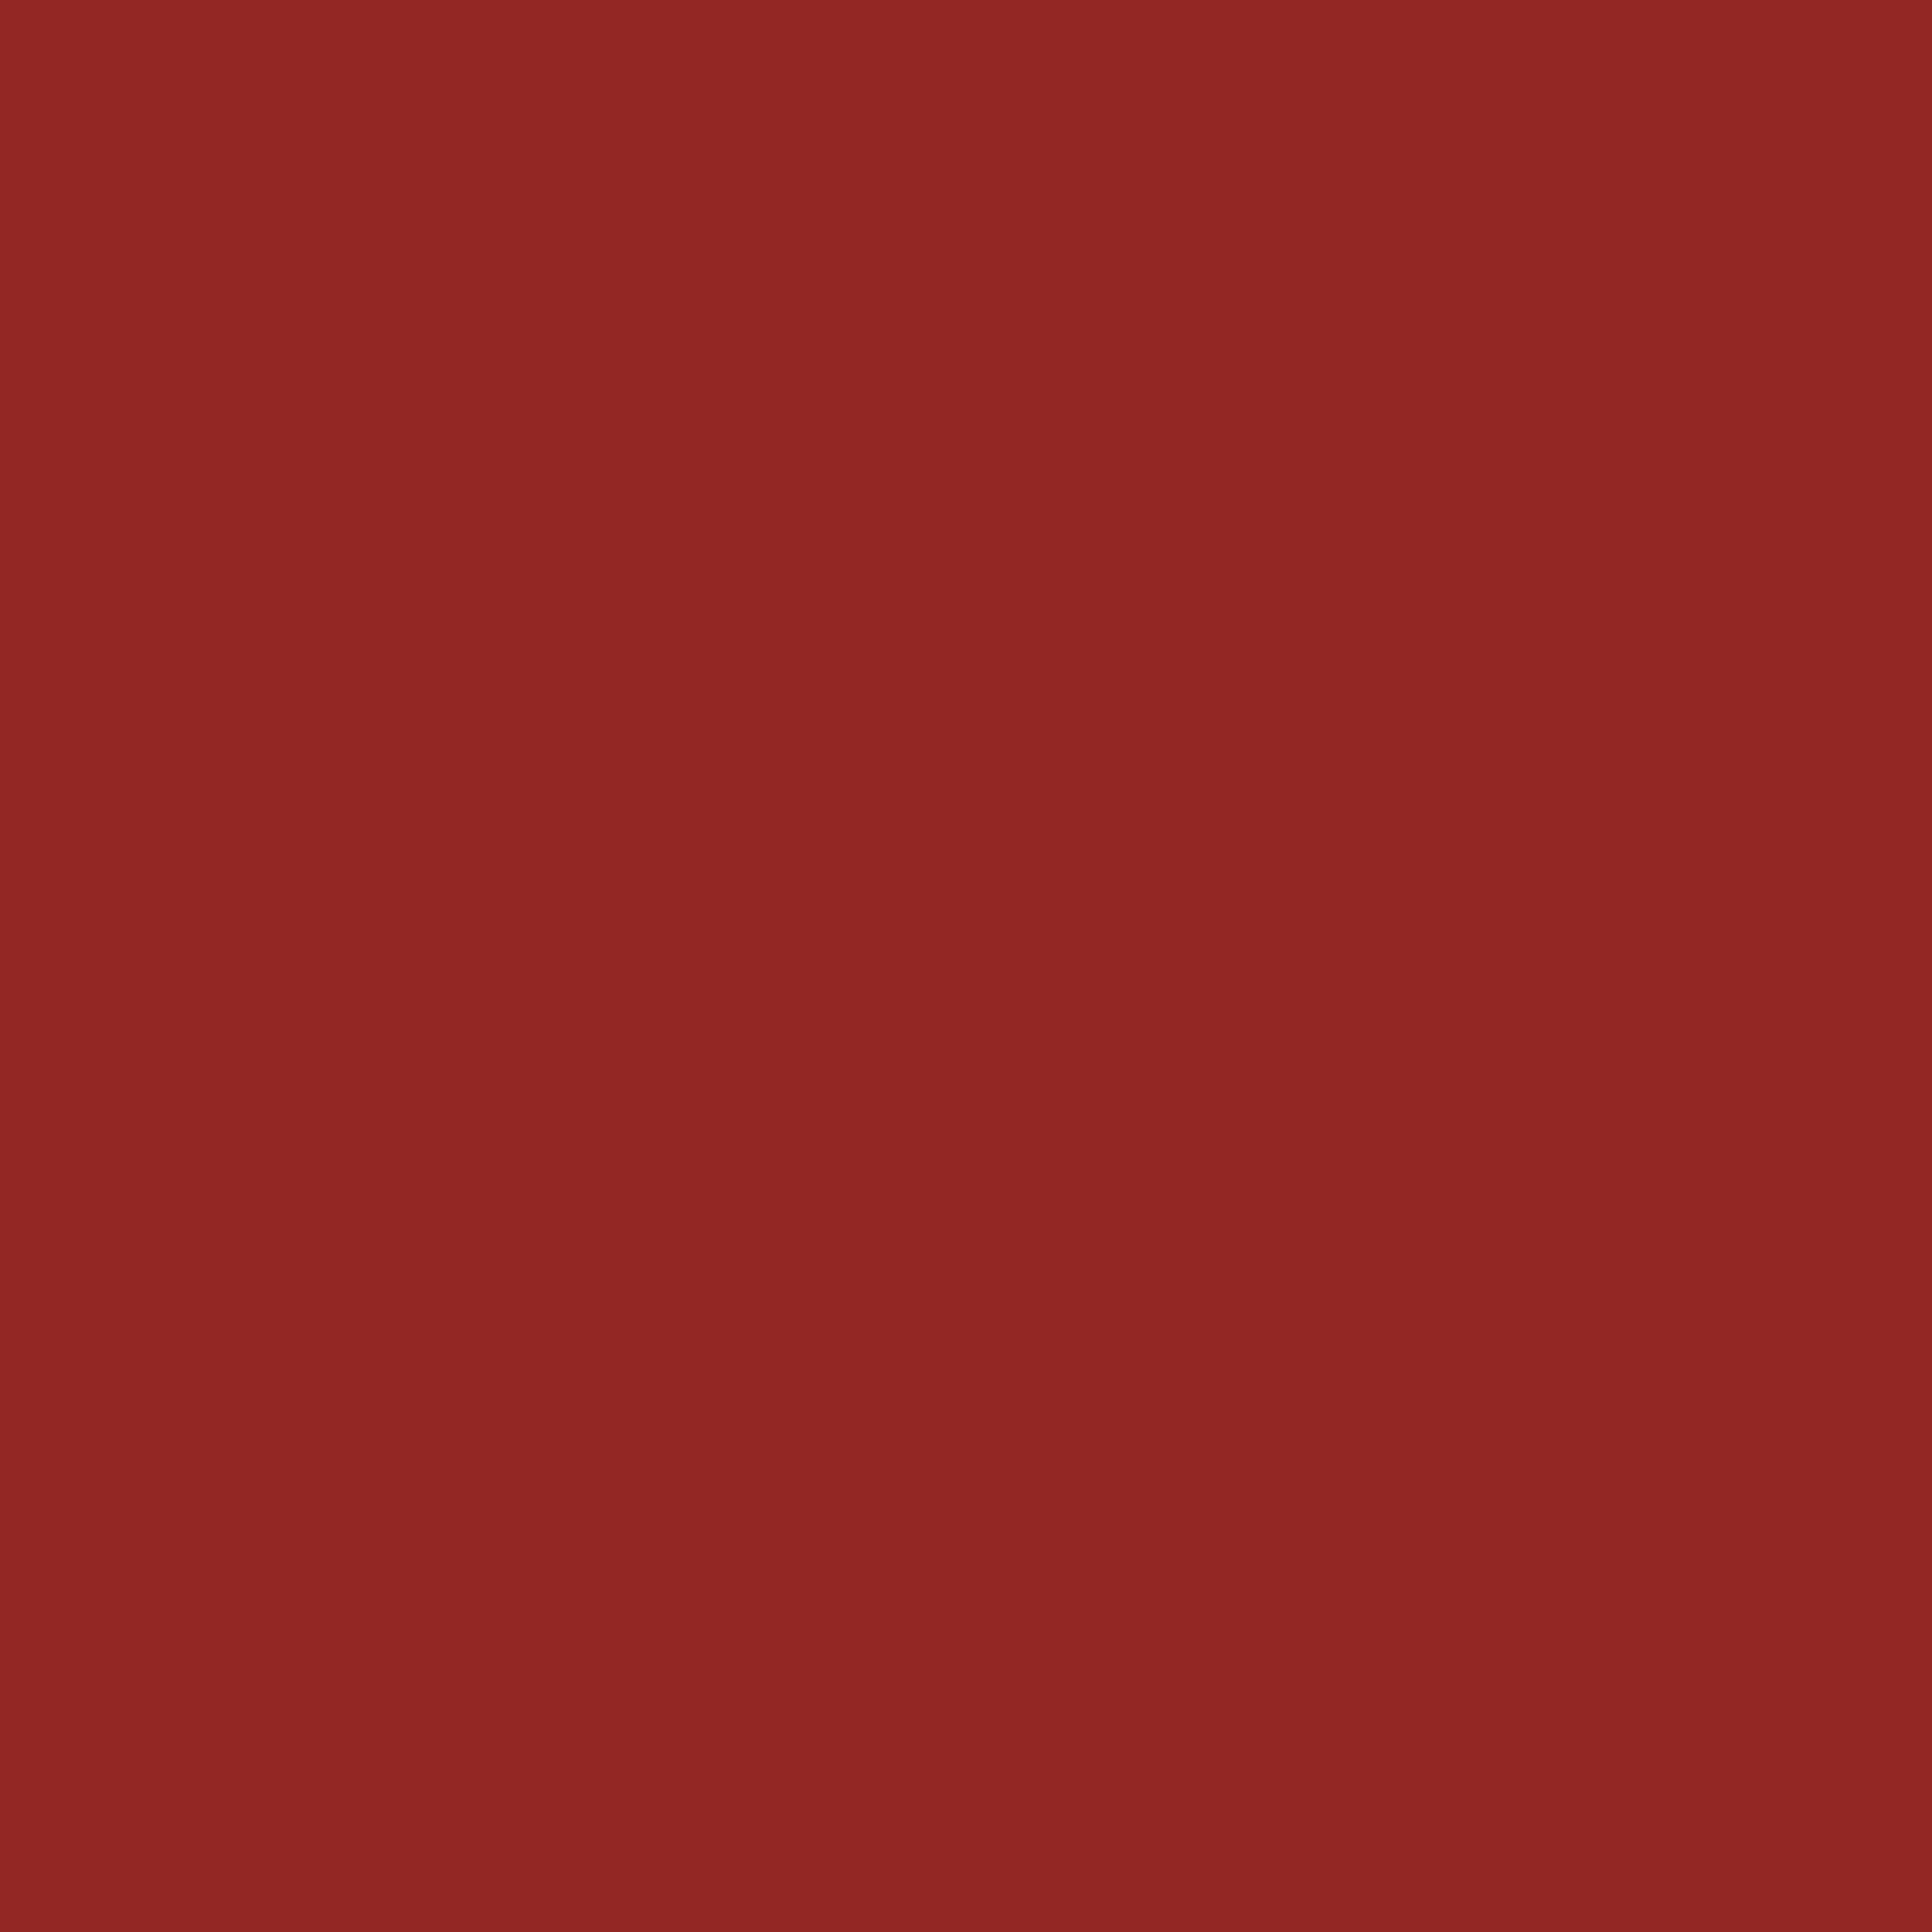 3600x3600 Vivid Auburn Solid Color Background